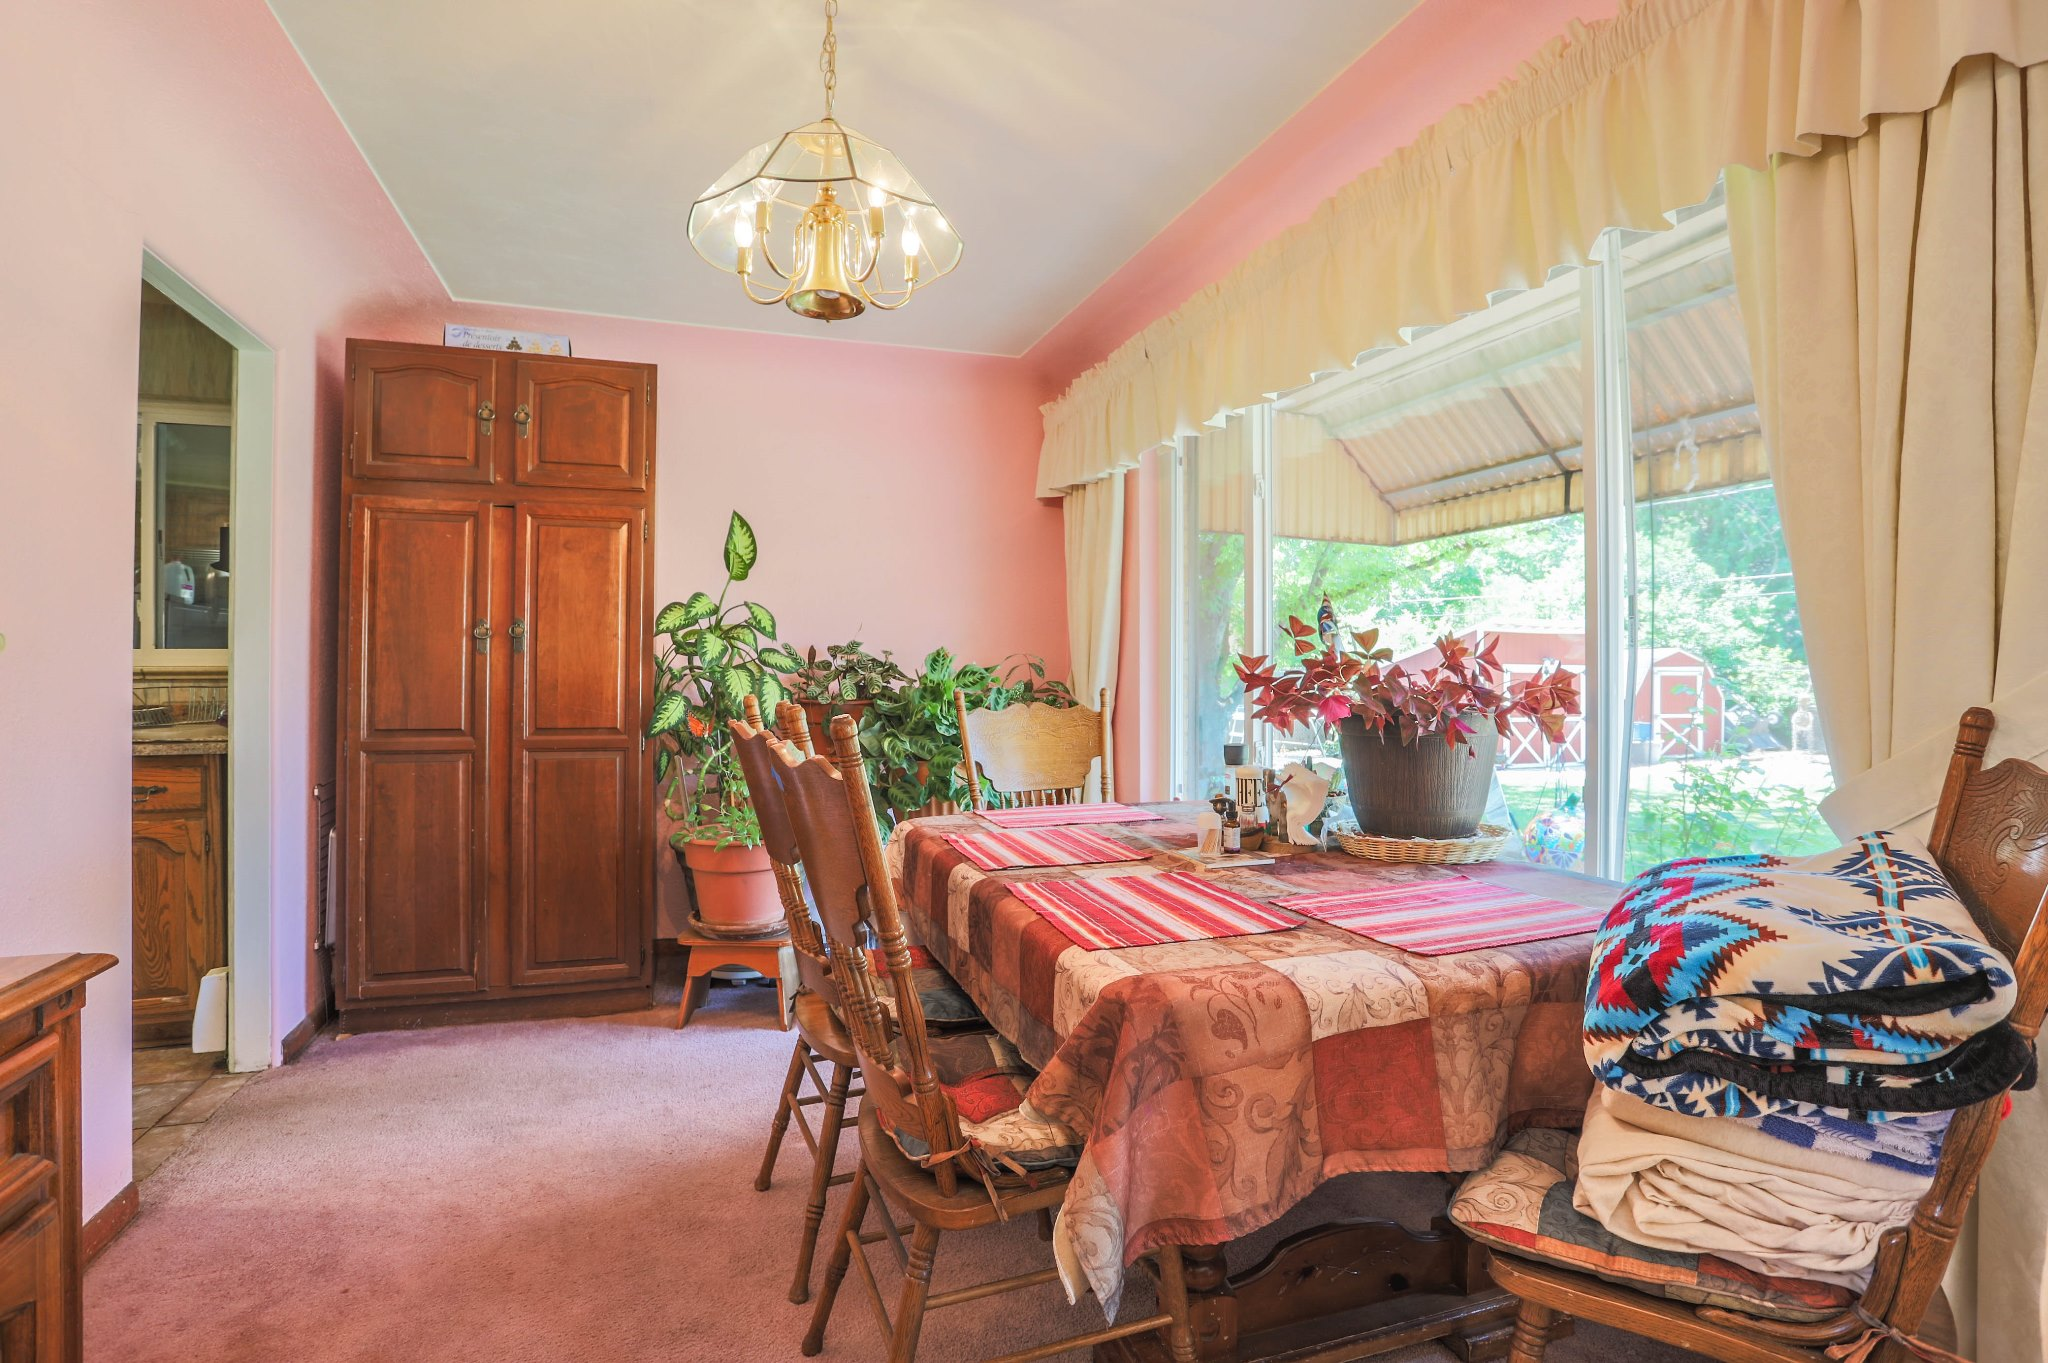 REAL ESTATE LISTING: 75 Zephyr St Lakewood Dining Room